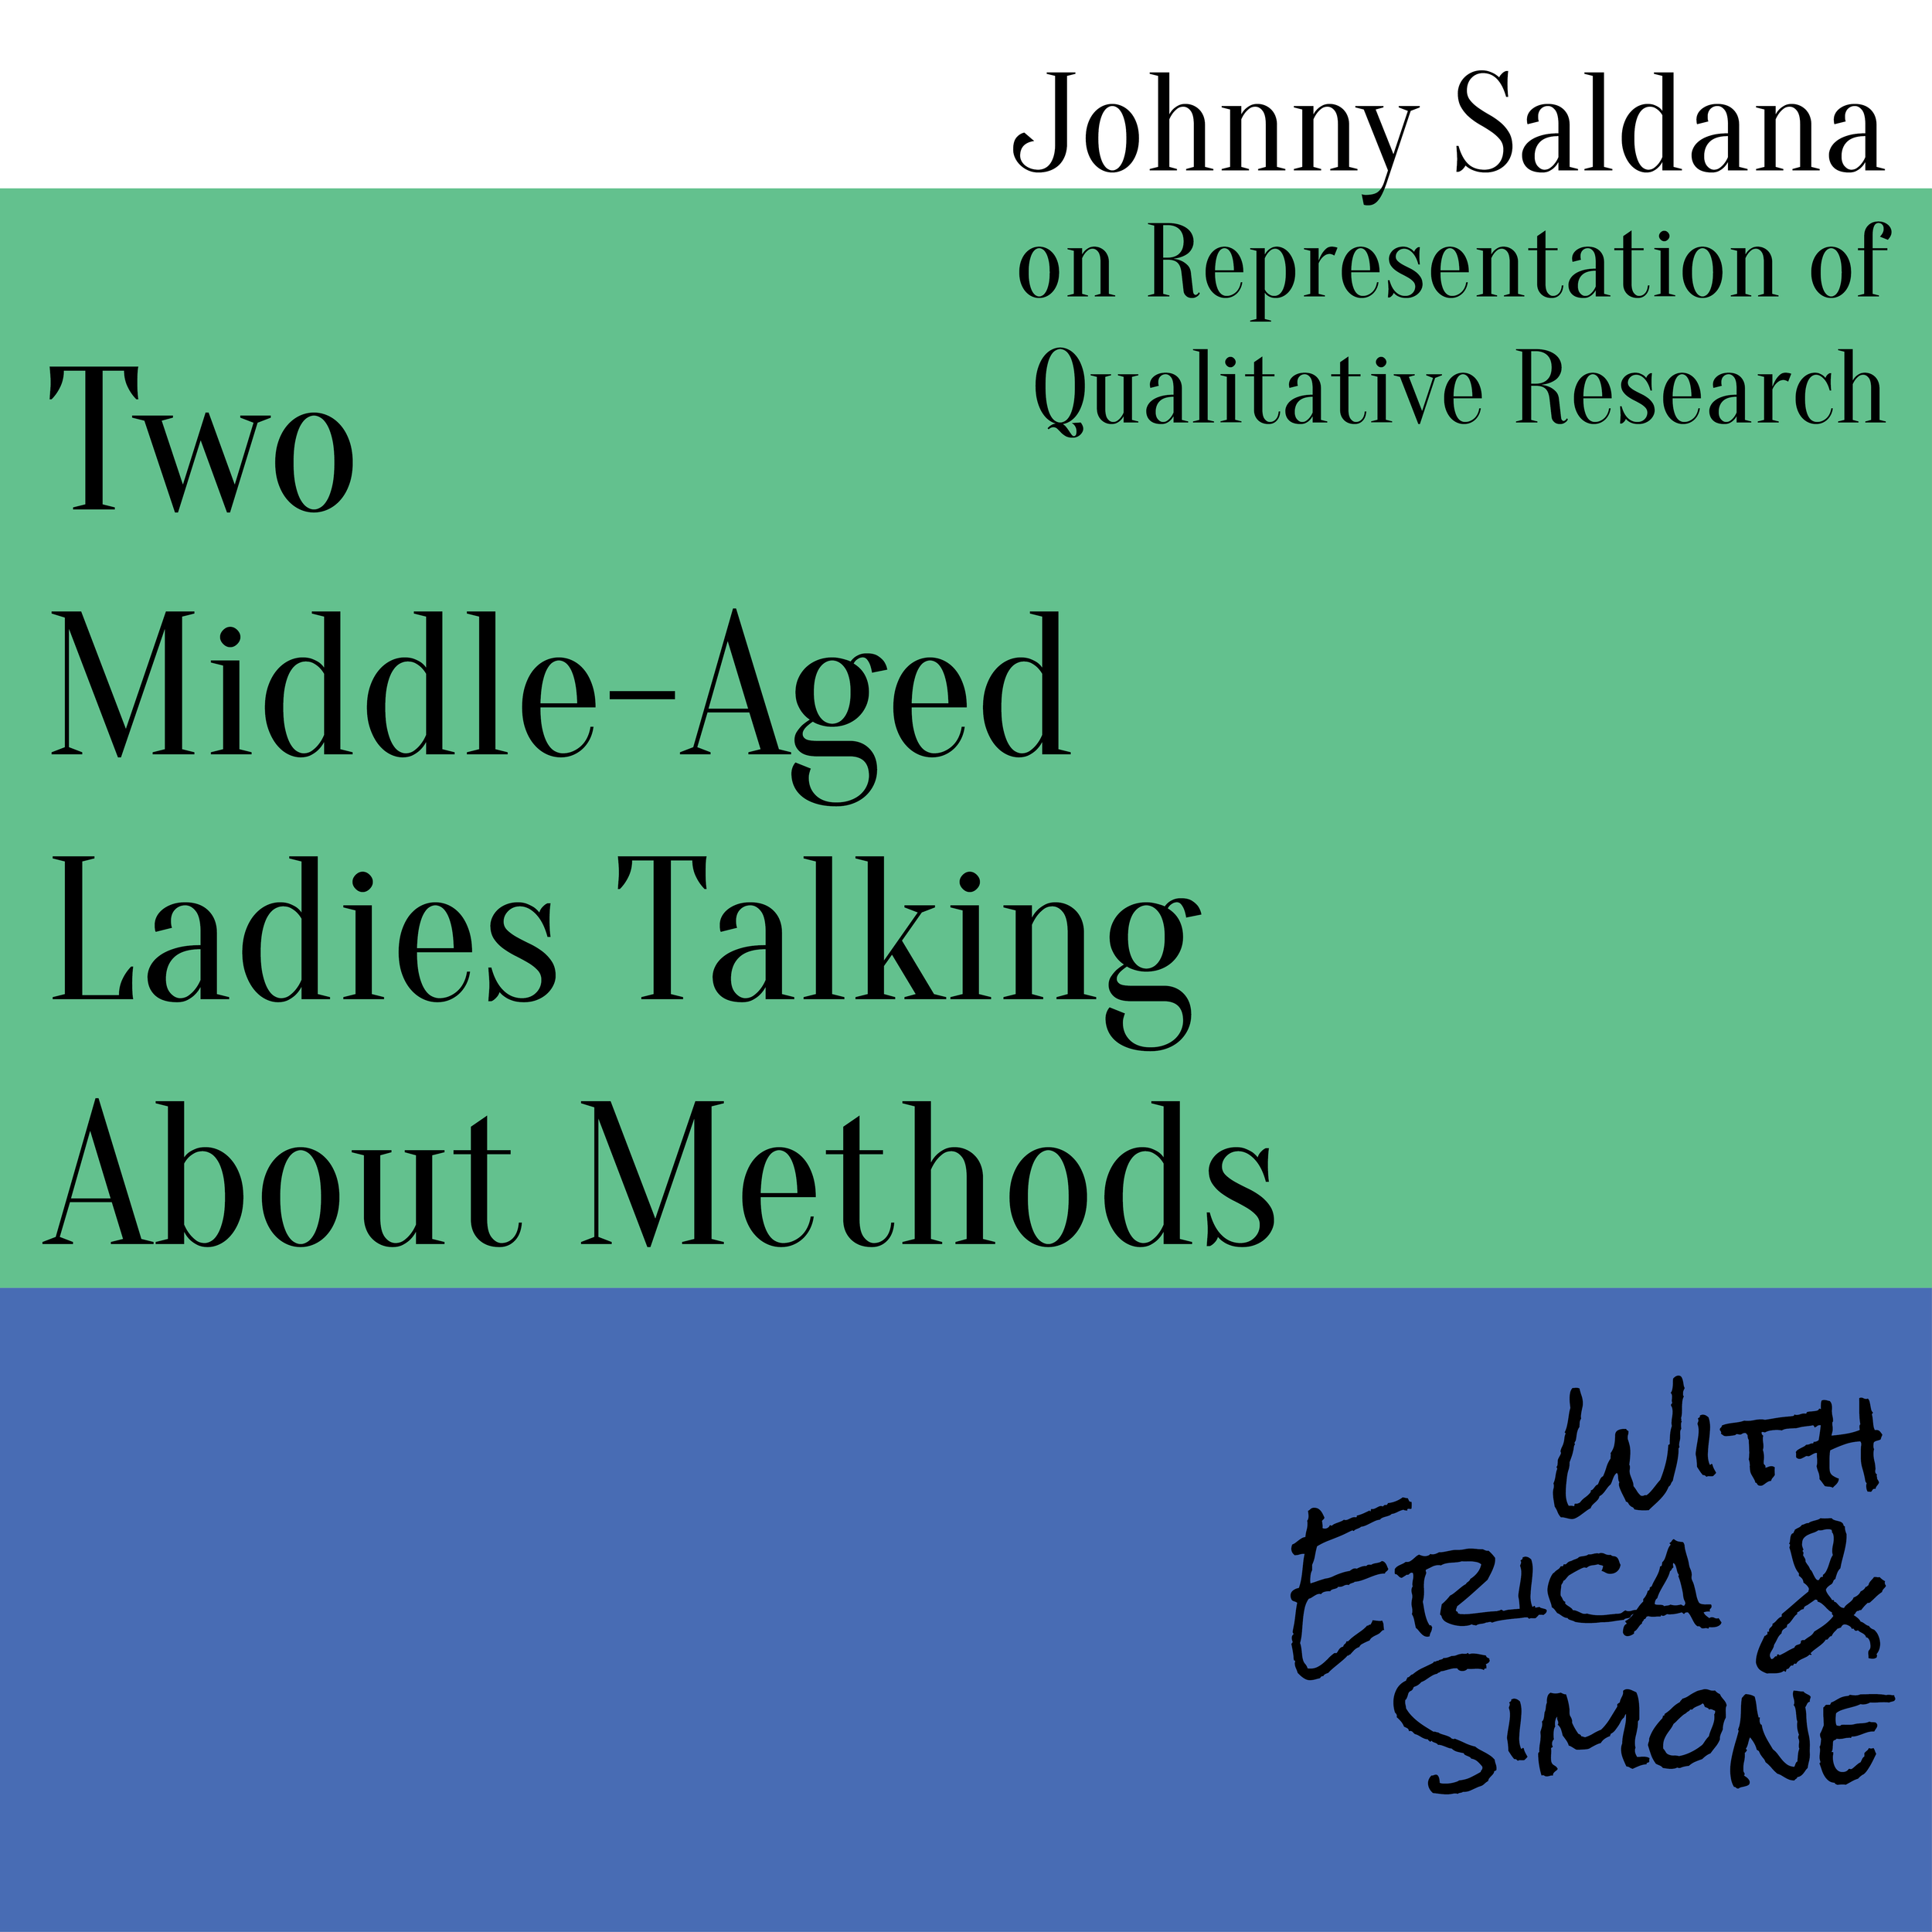 Johnny Saldana on Representation of Qualitative Research